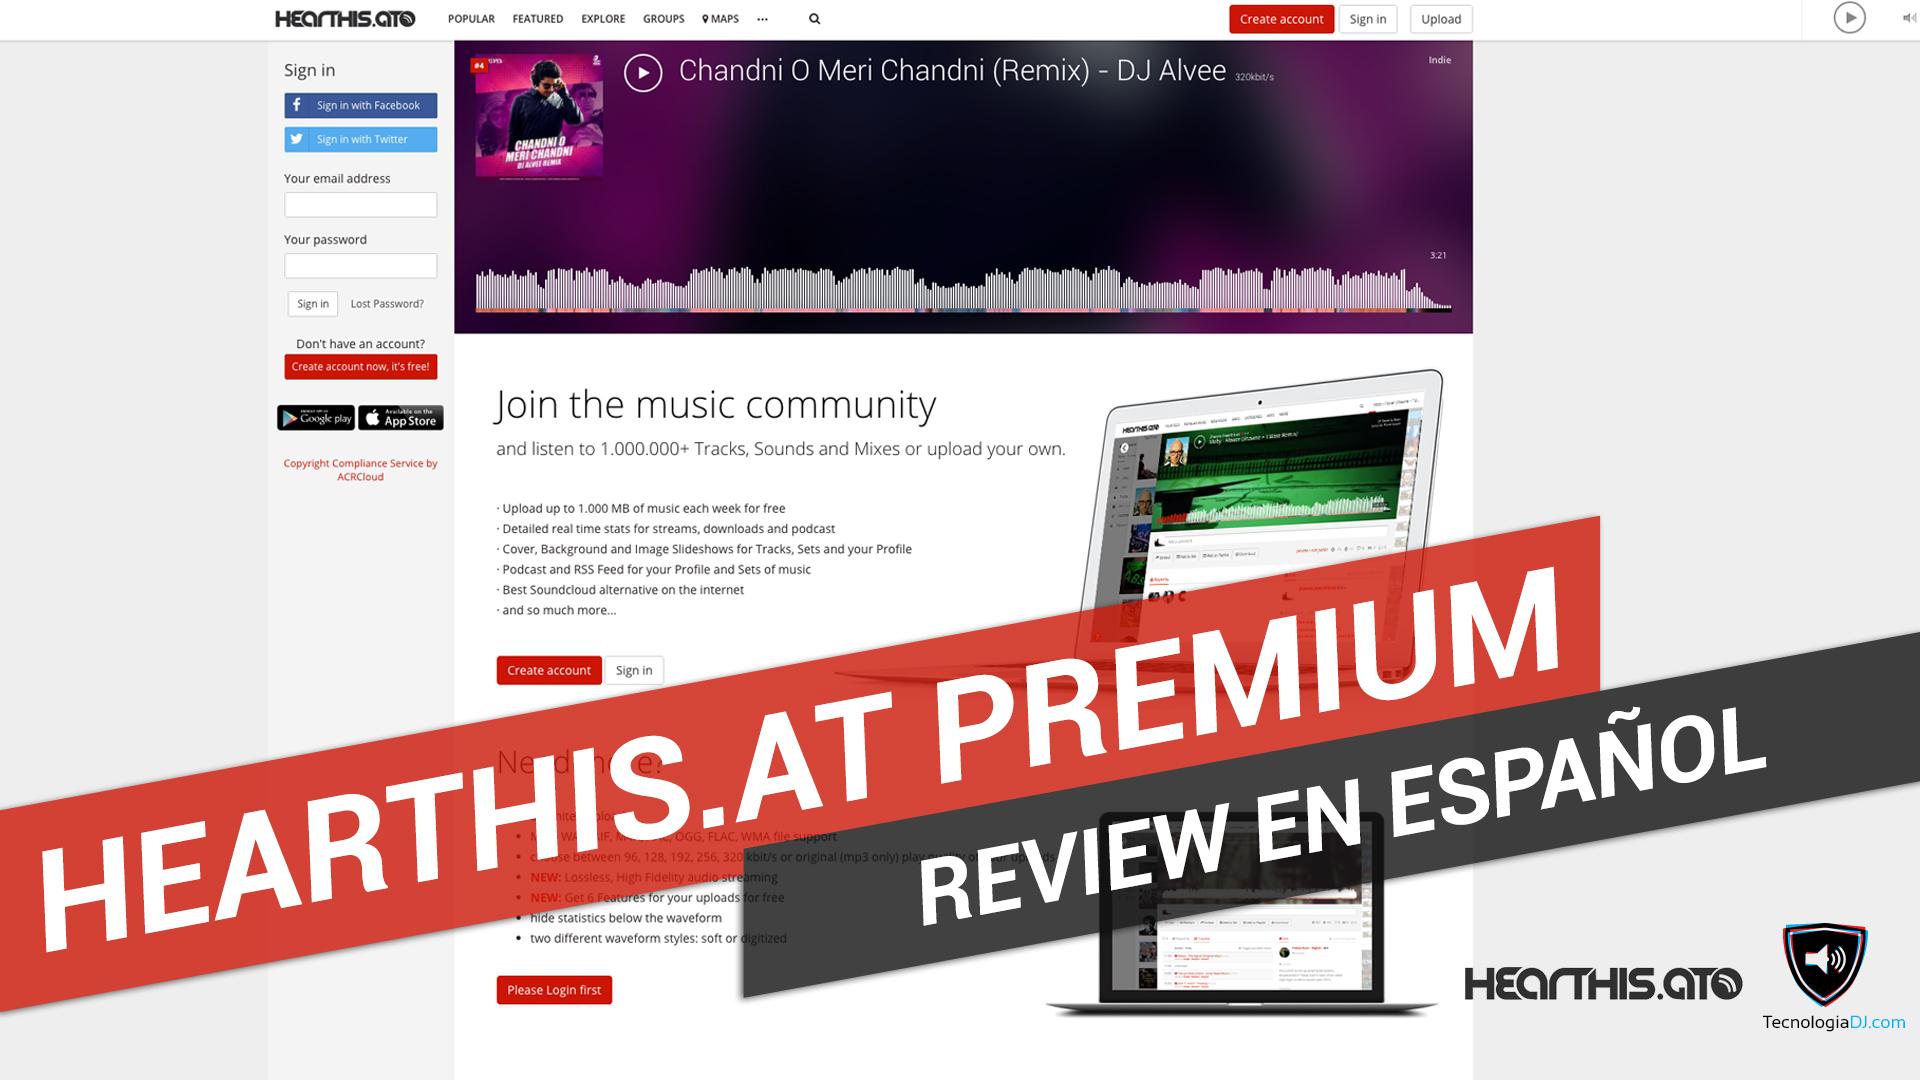 Review en español Hearthis.at Premium